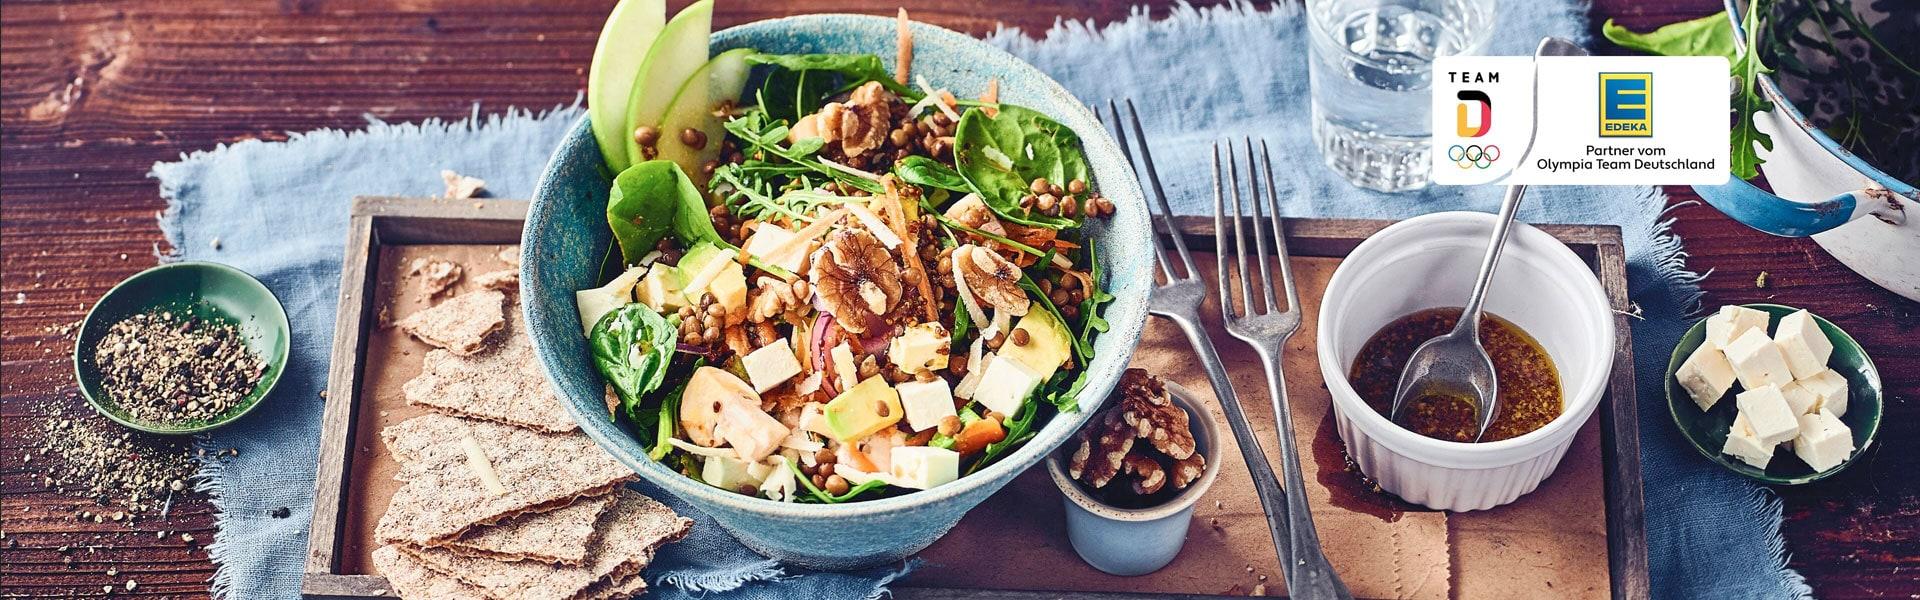 Spinat-Rucola-Feta-Salat mit Avocado